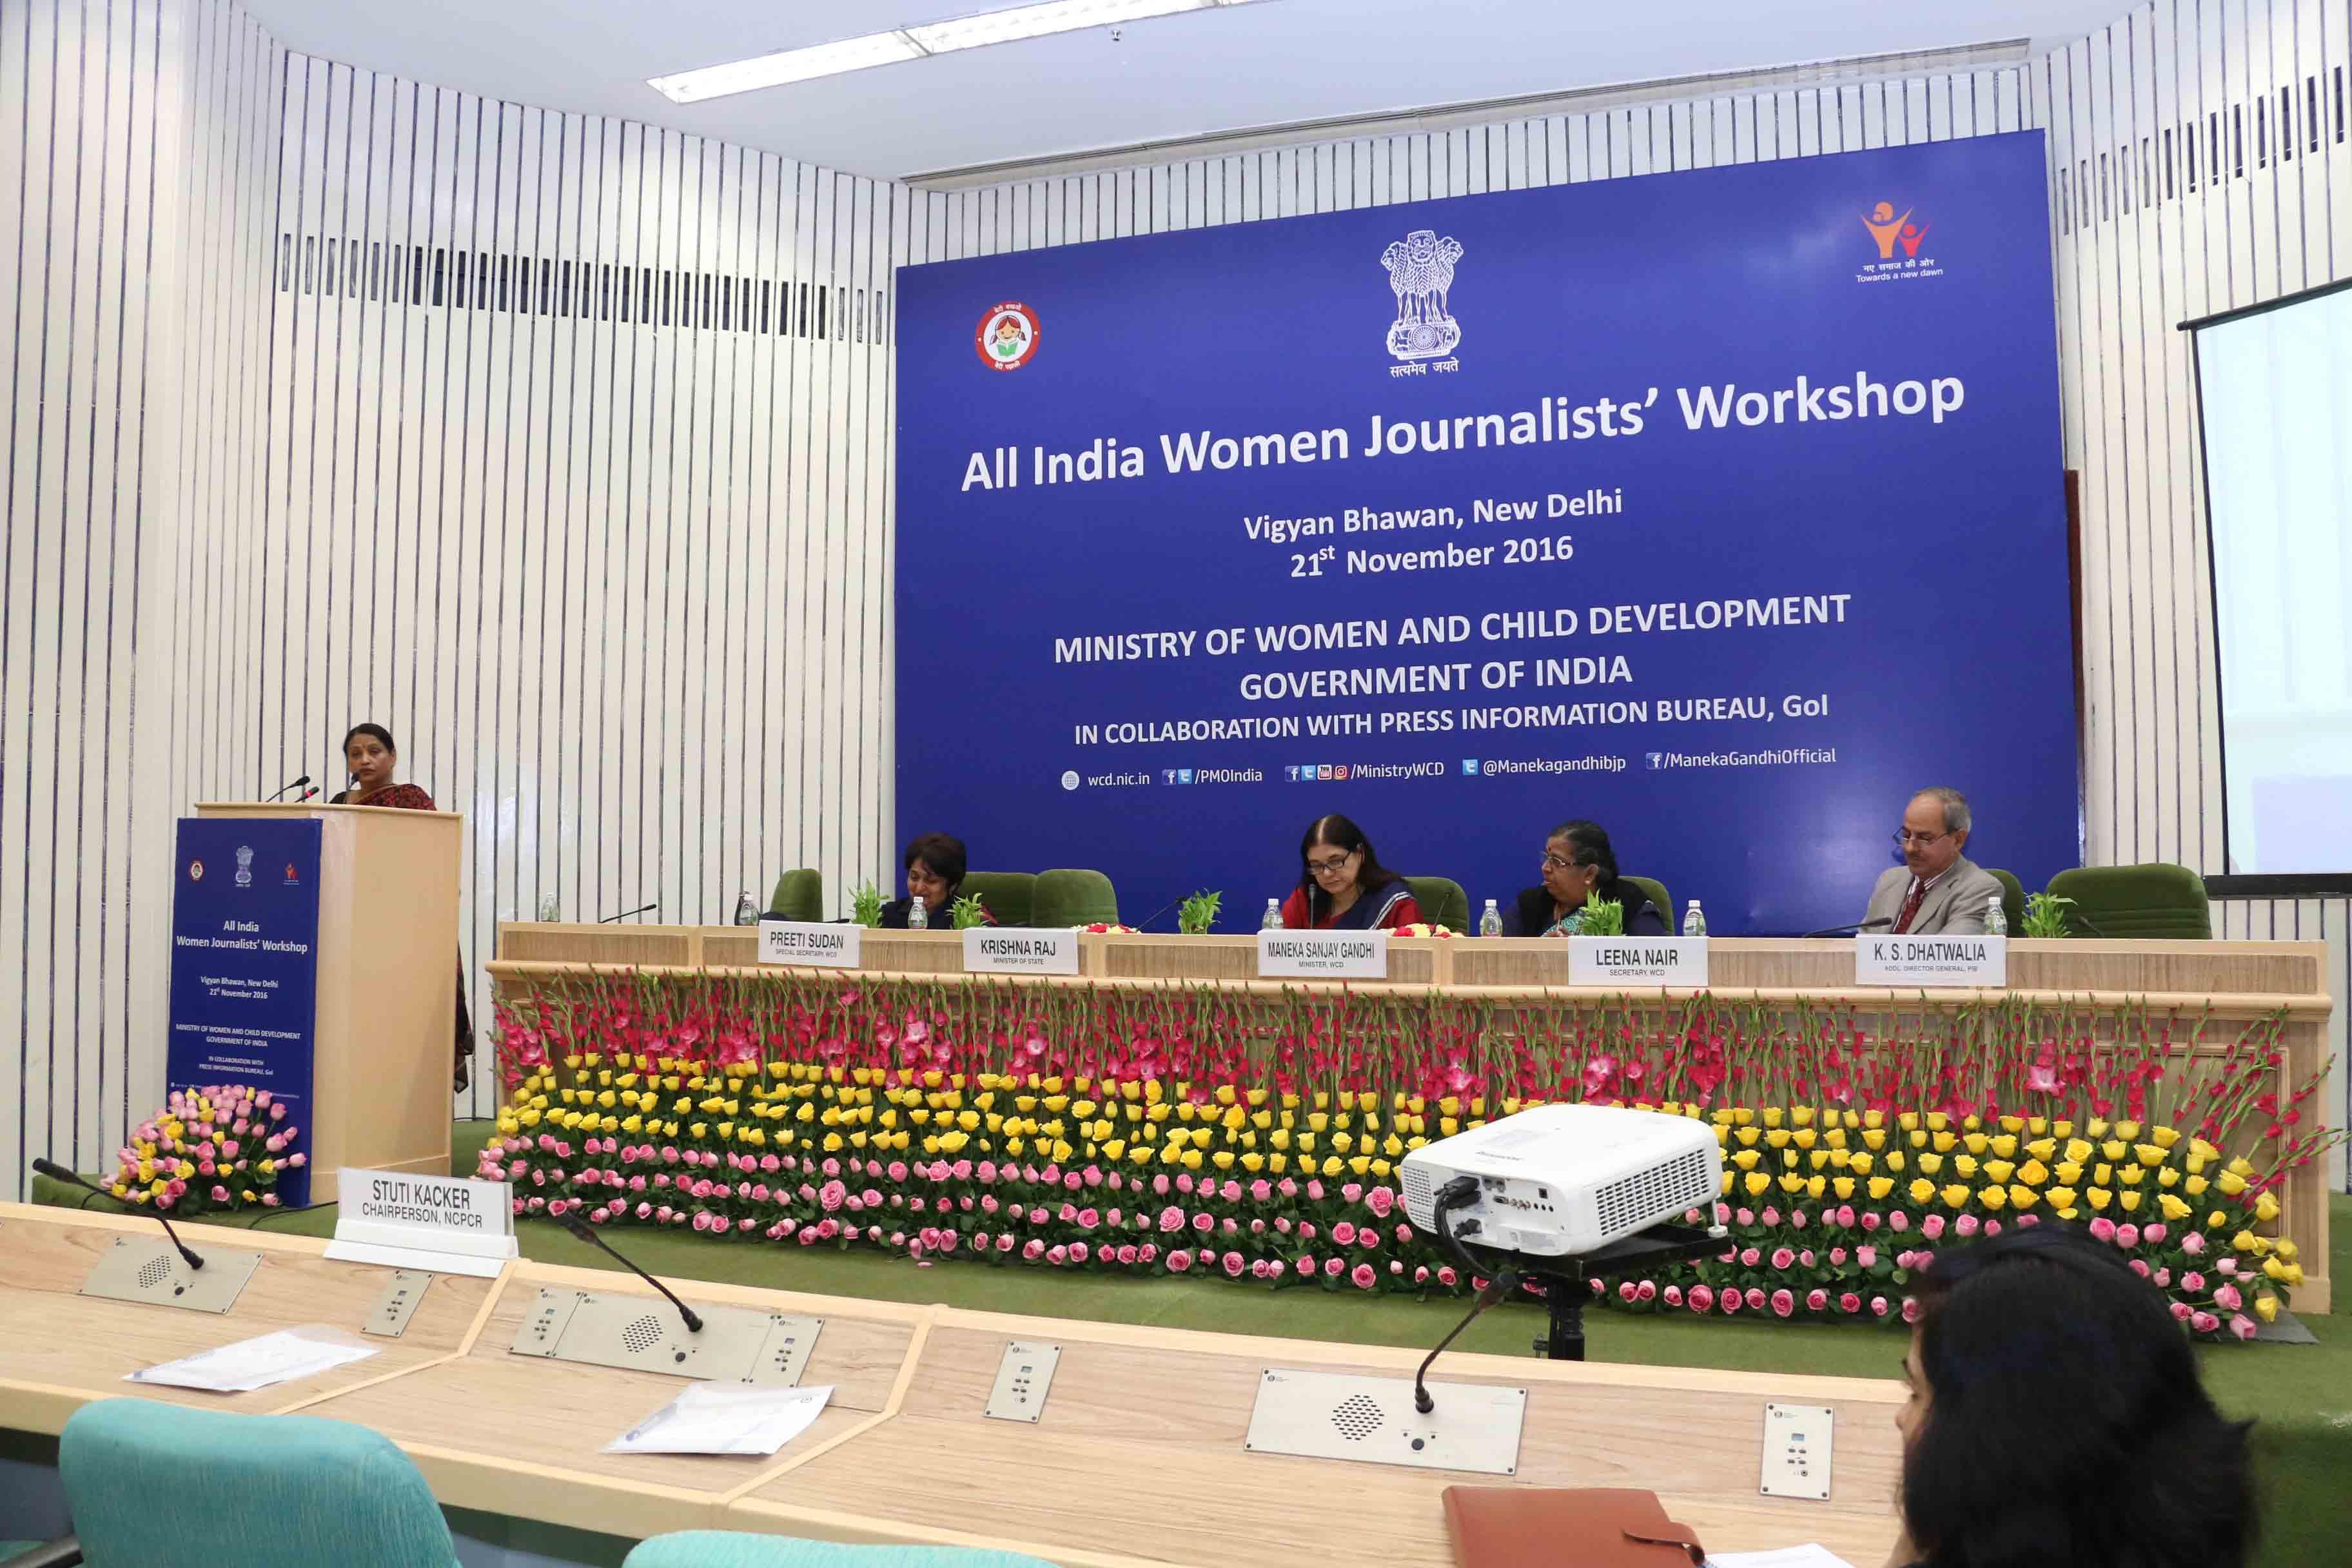 All India Women Journalists Workshop at Vigyan Bhawan 4